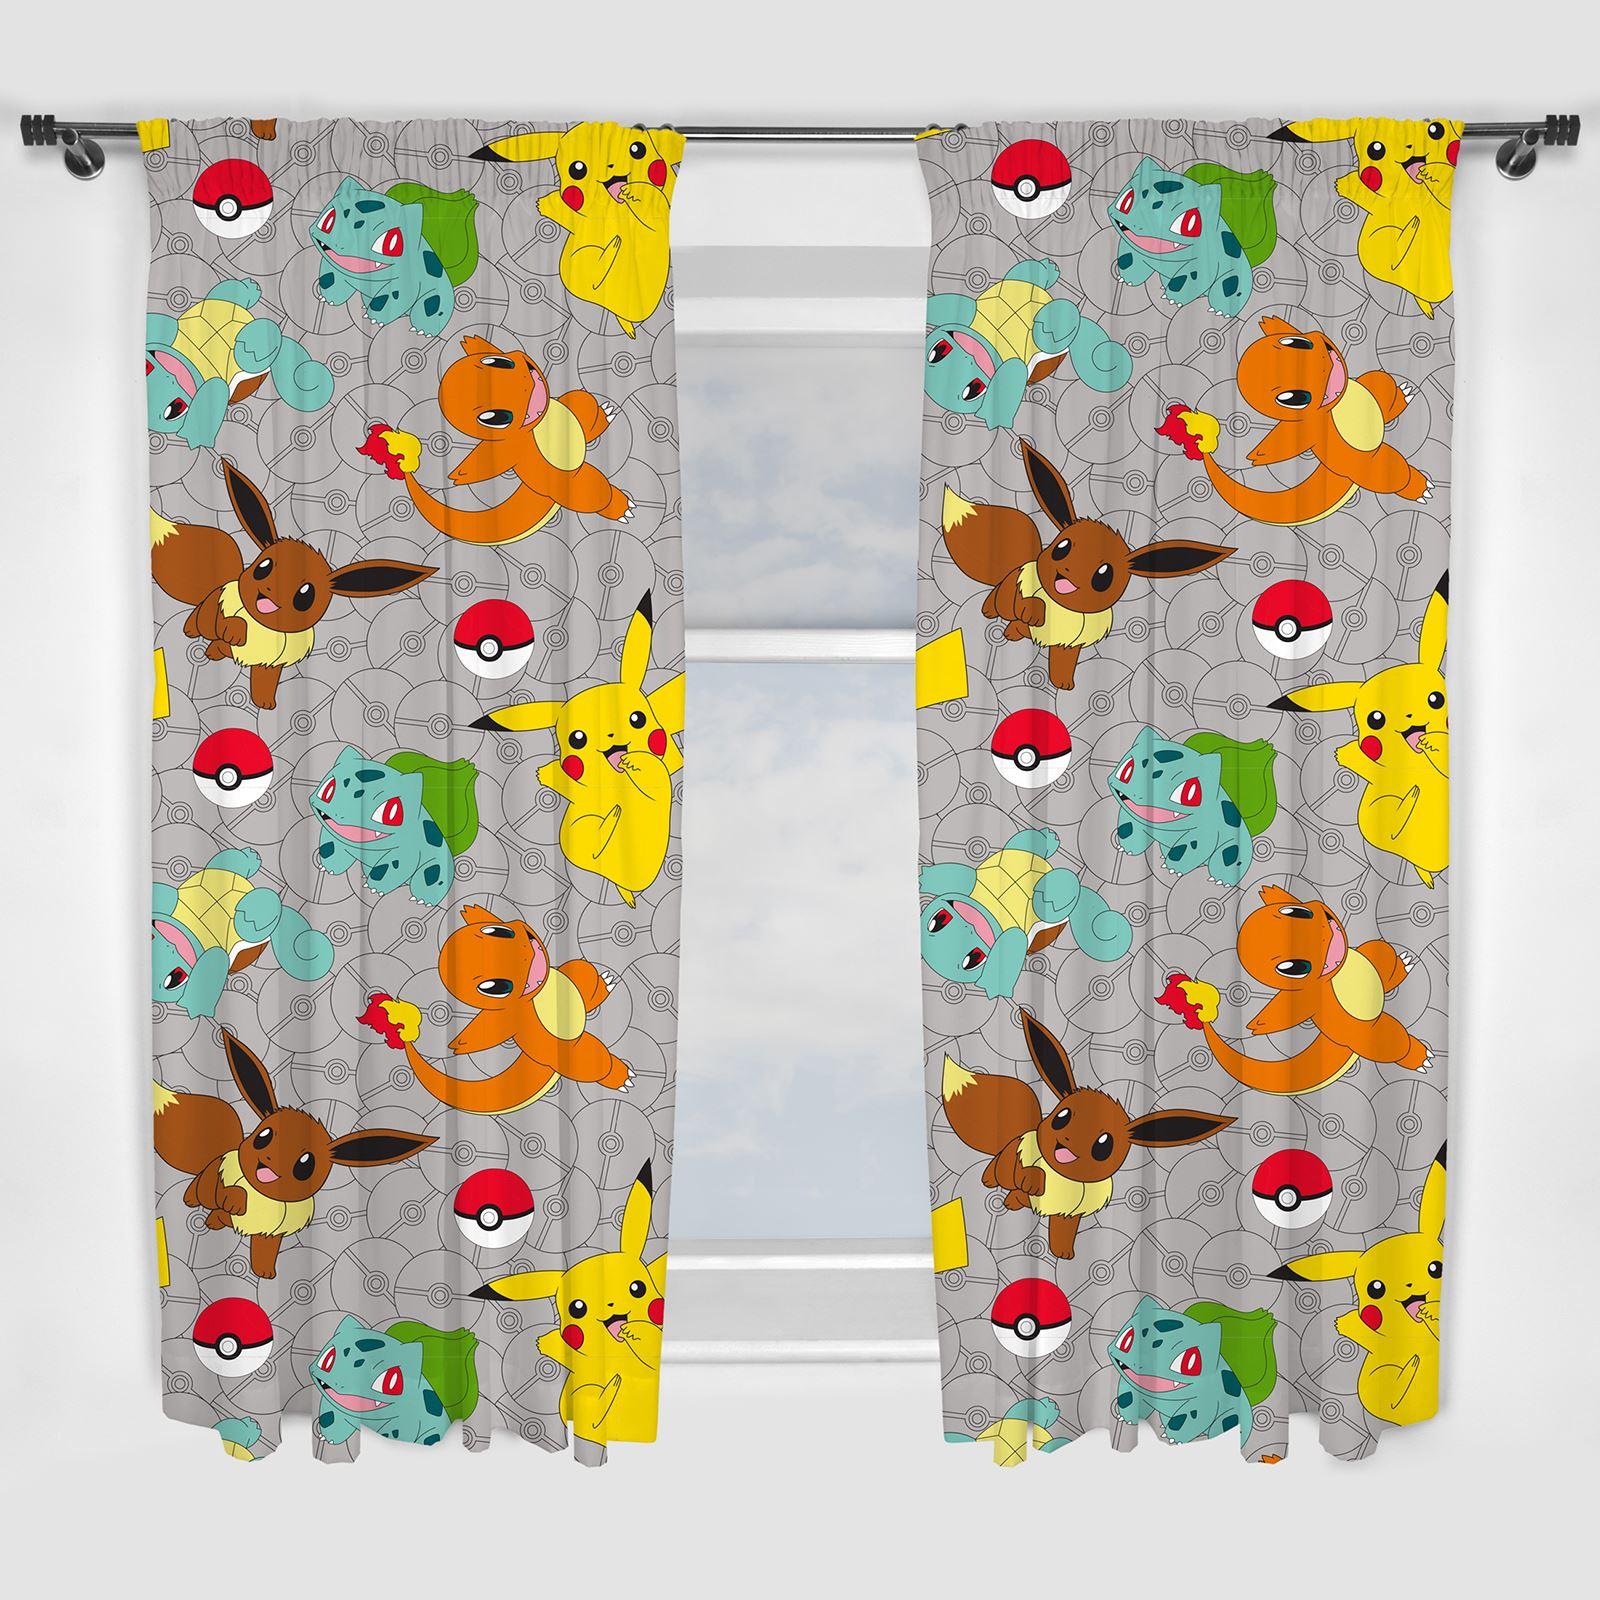 Disney & Character Jungen Vorhänge Schlafzimmer Marvel Paw Patrol Pokemon Thomas Pokemon Fang 137cm